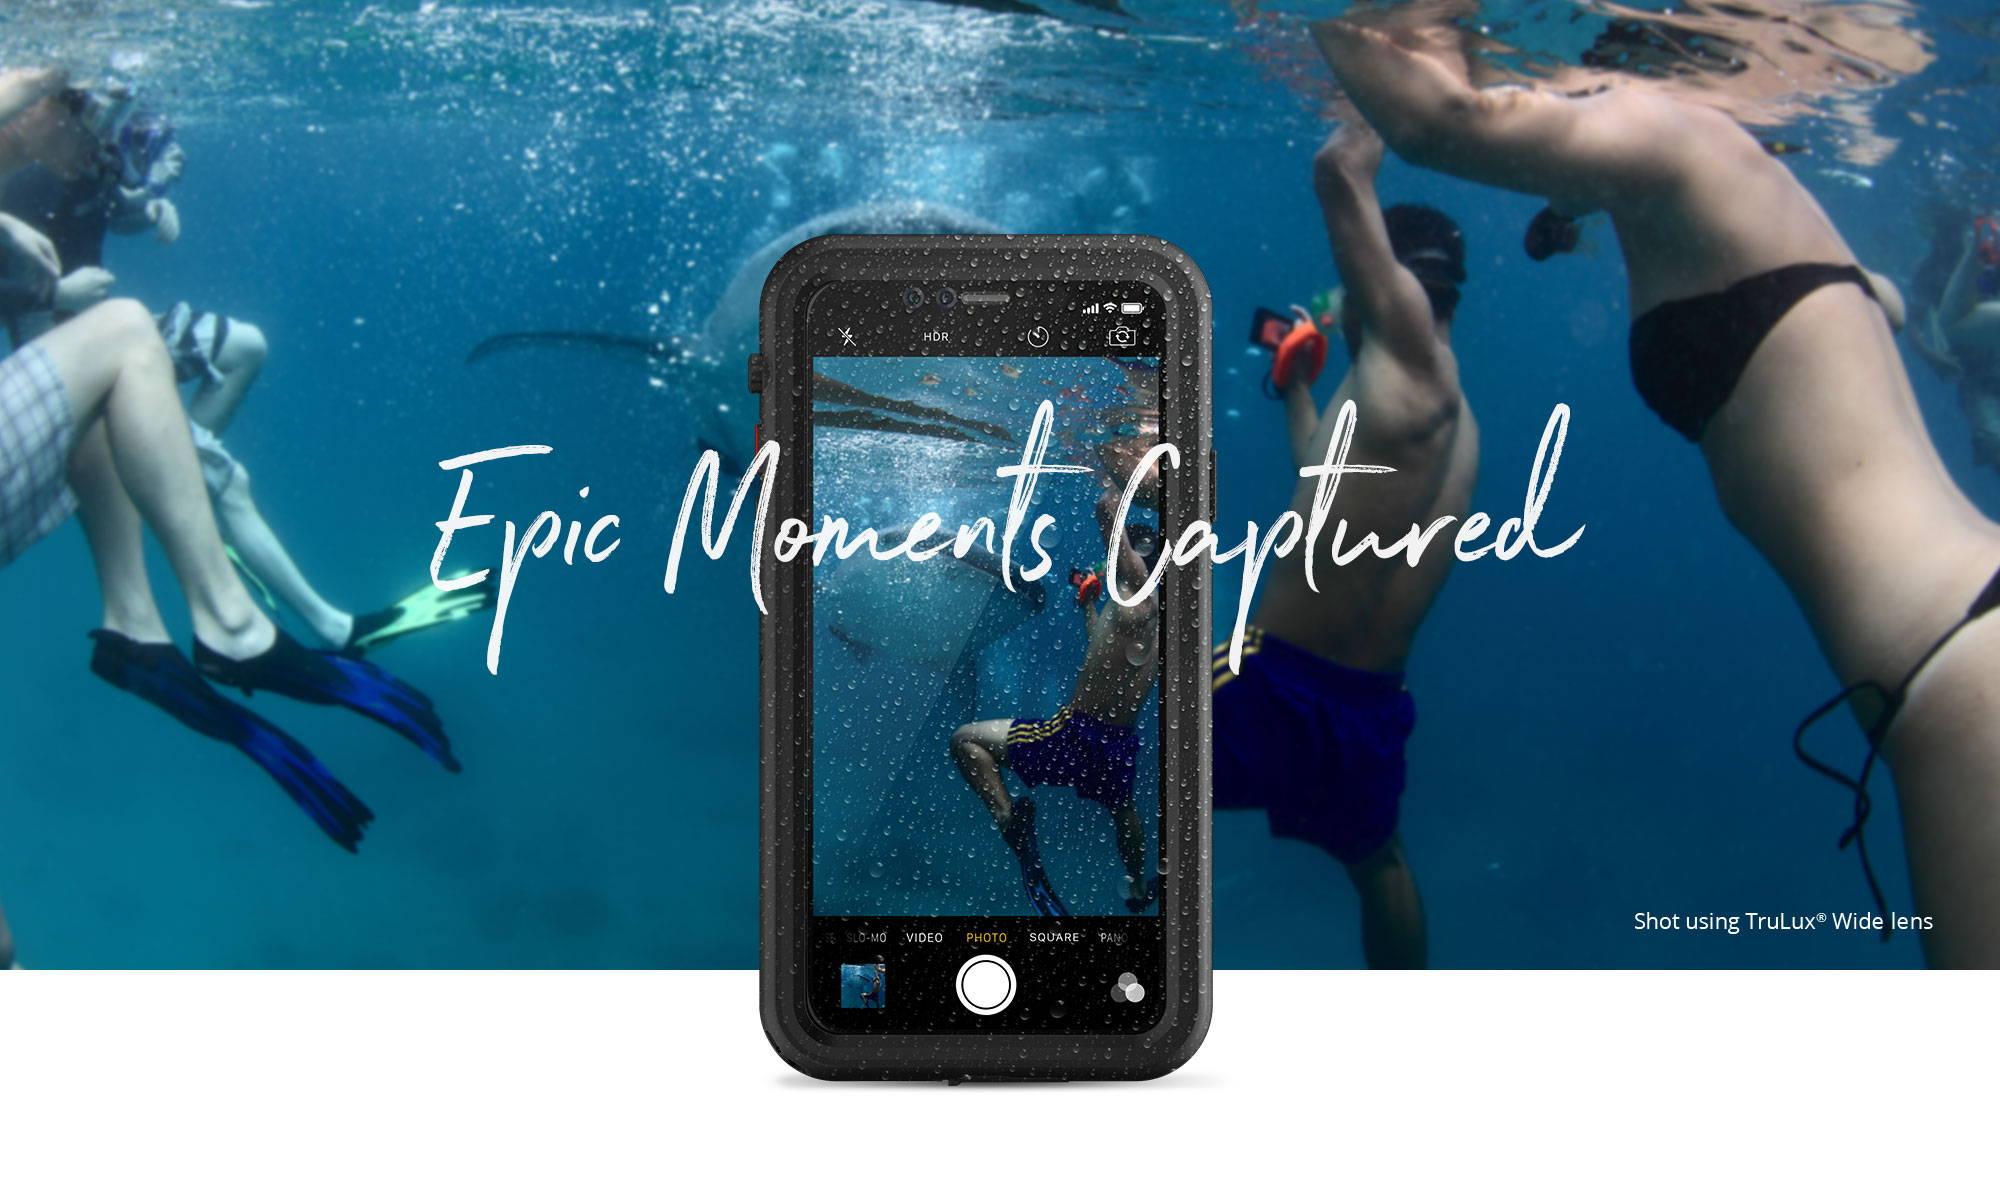 epic moments captured